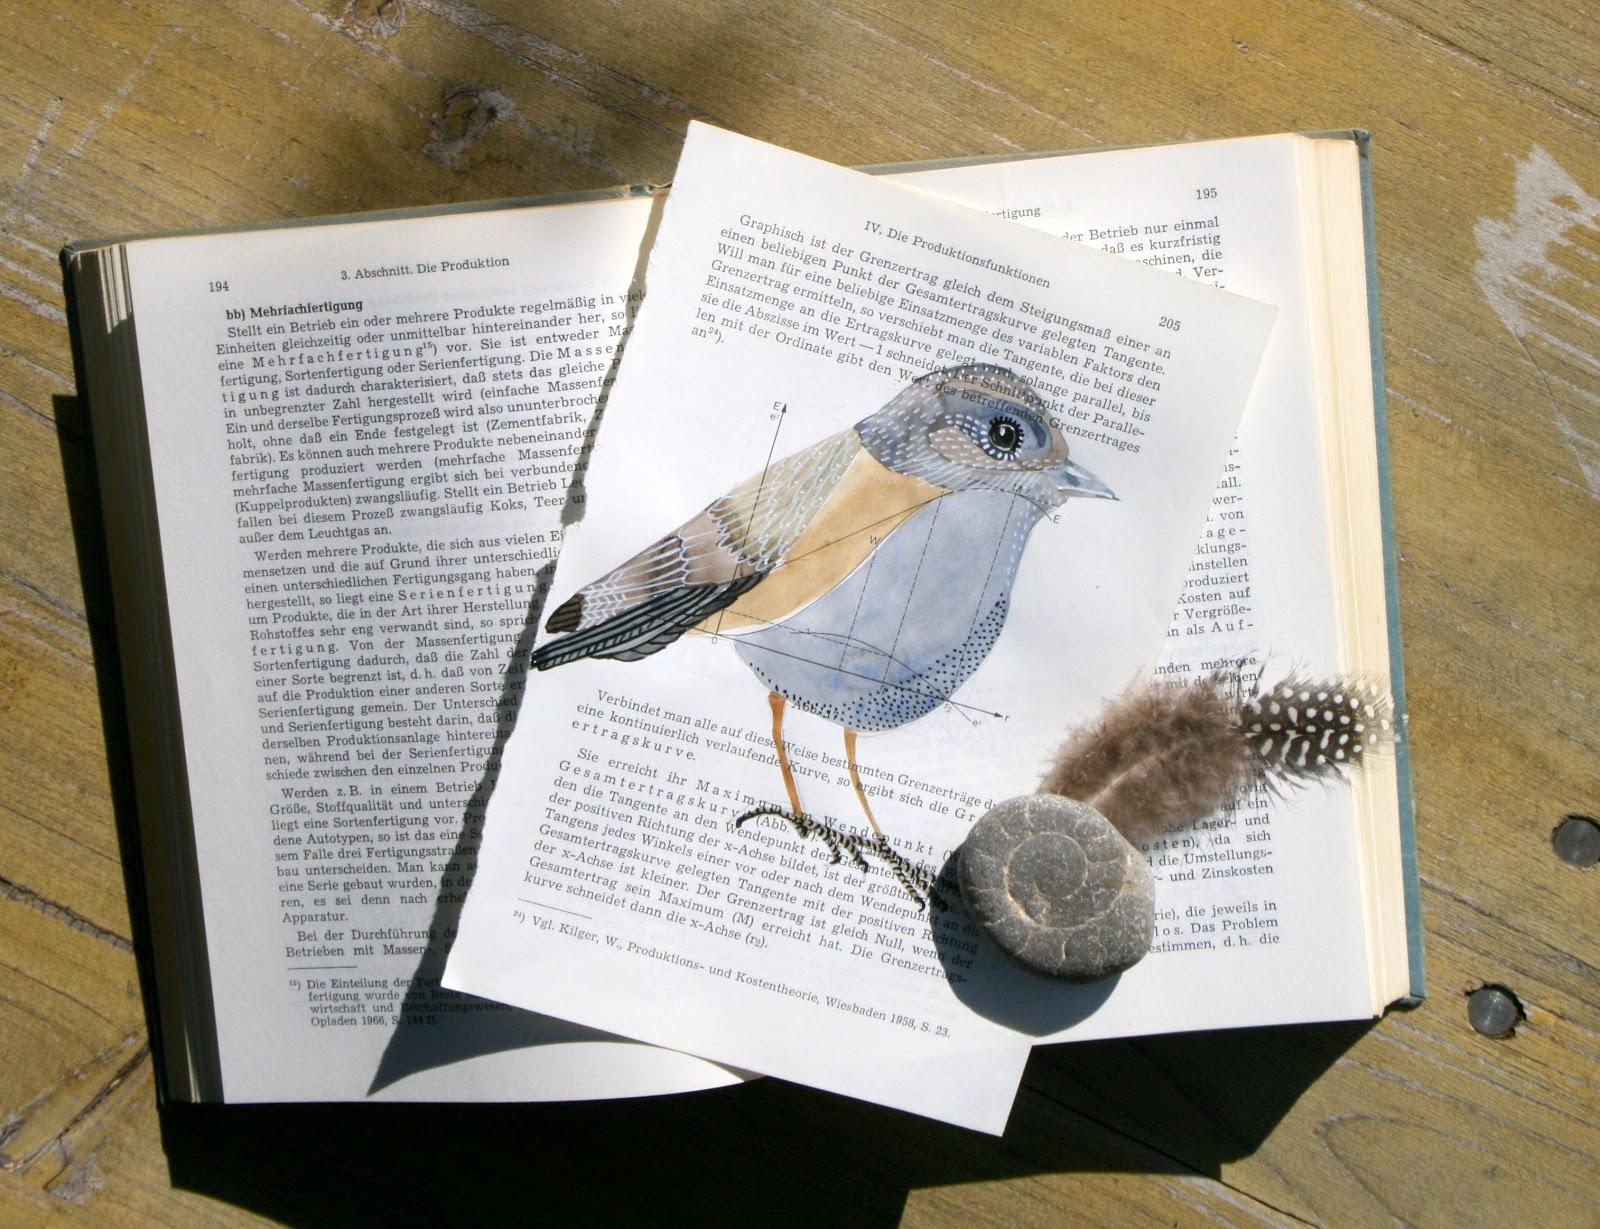 shore stein papier buch pdf